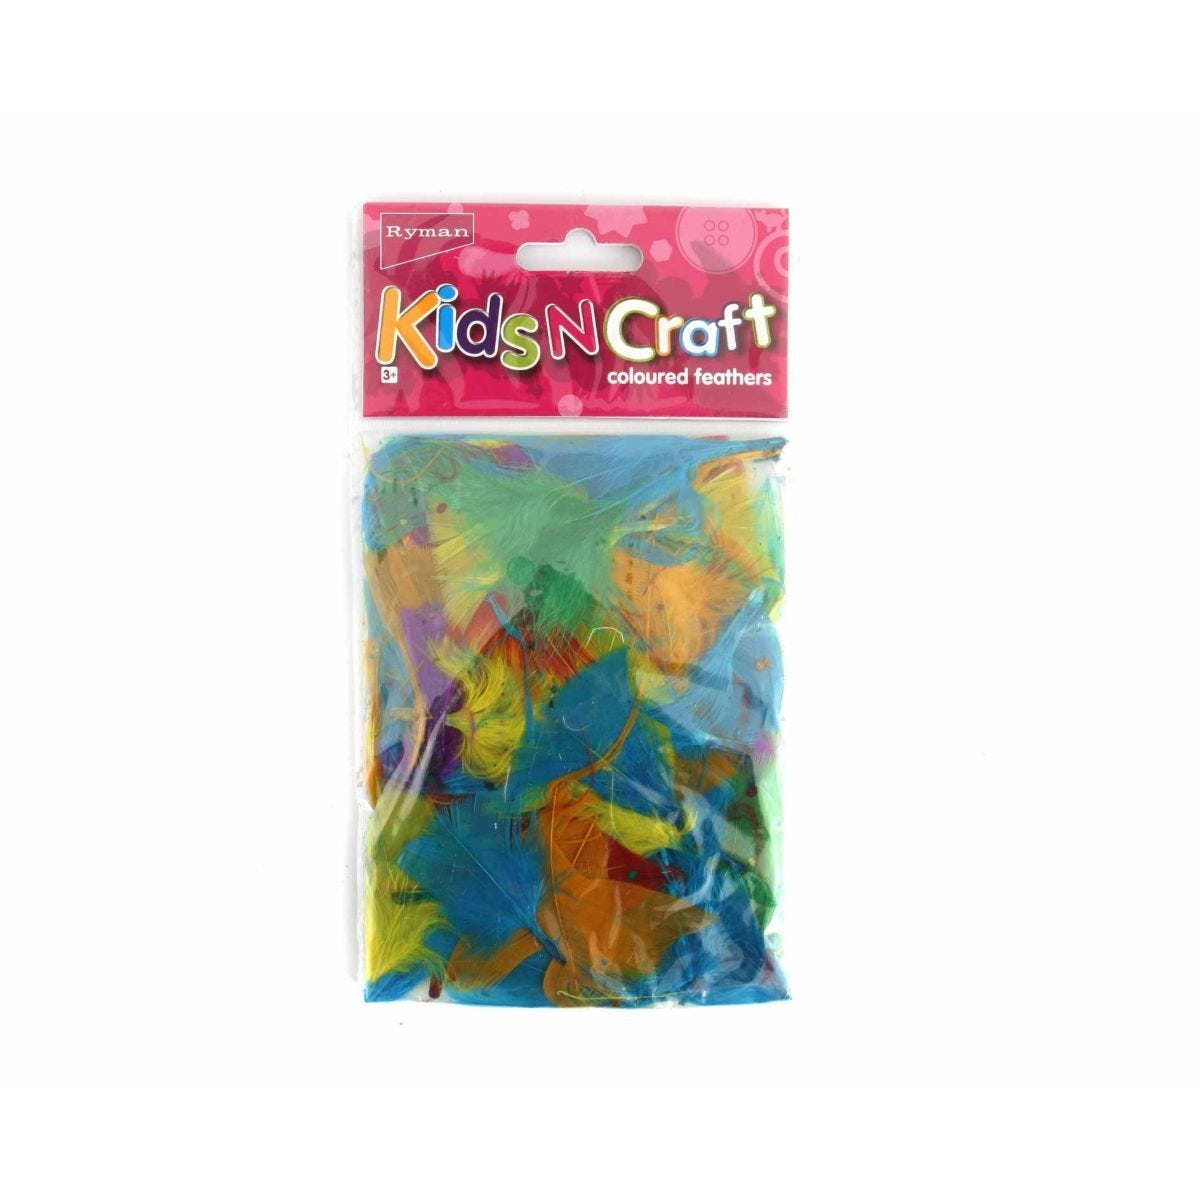 Ryman Activity Kit Colour Feathers